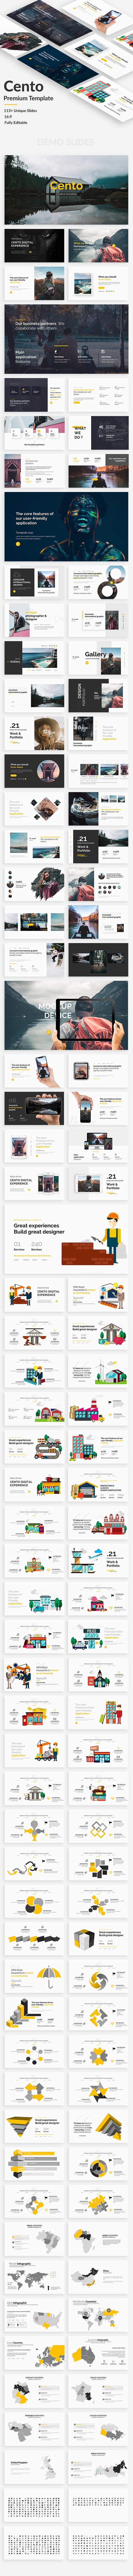 Cento Design Premium Keynote Template - Creative Keynote Templates